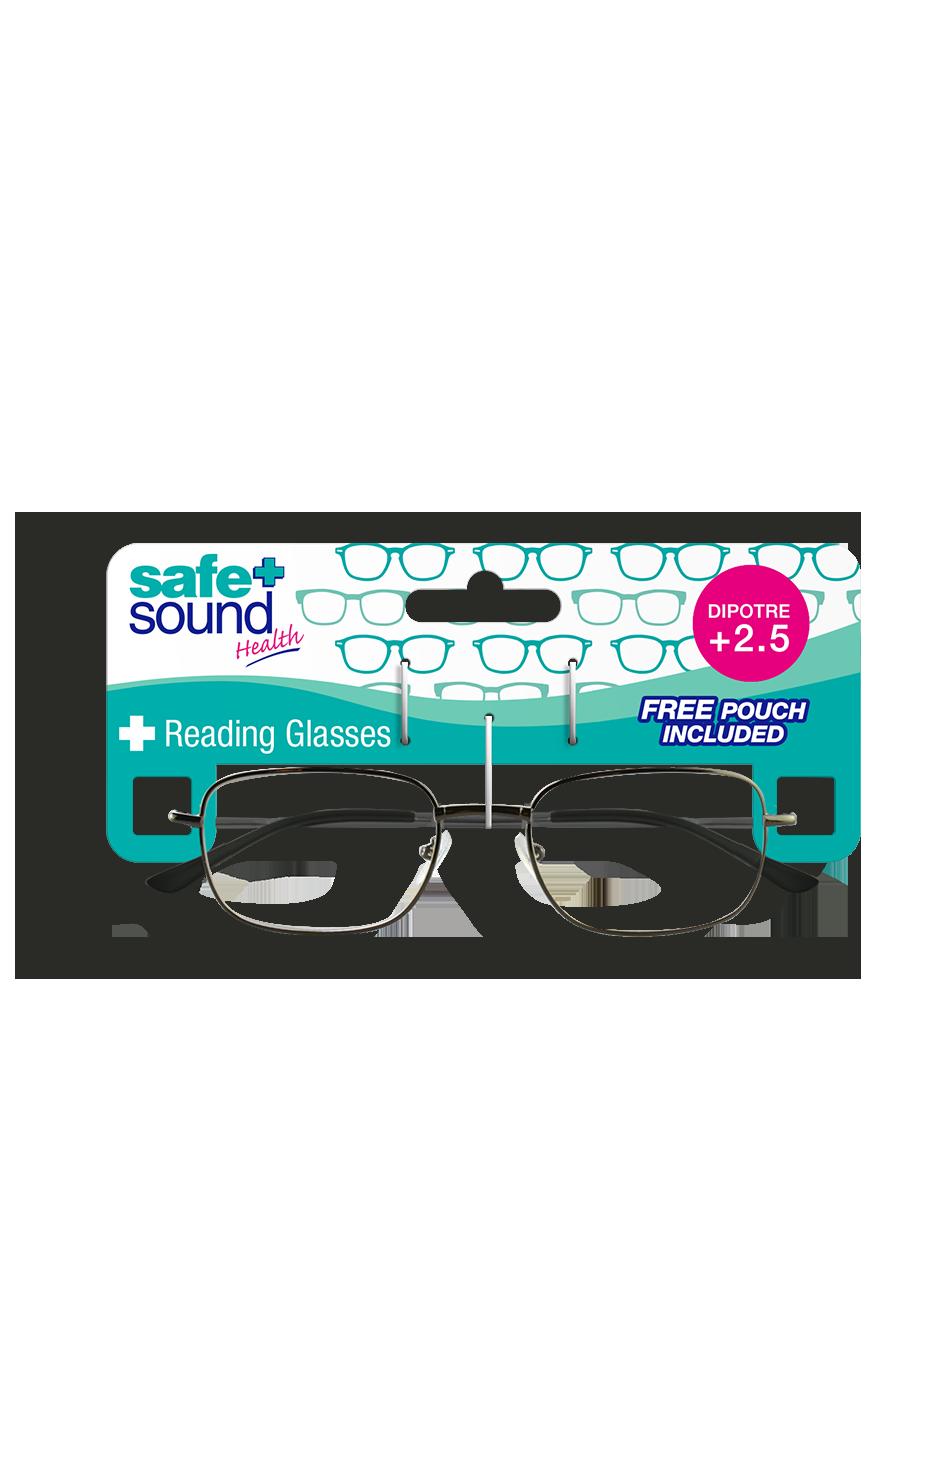 Safe and Sound Health Matt Black Reading Glasses 2.5 Dioptre